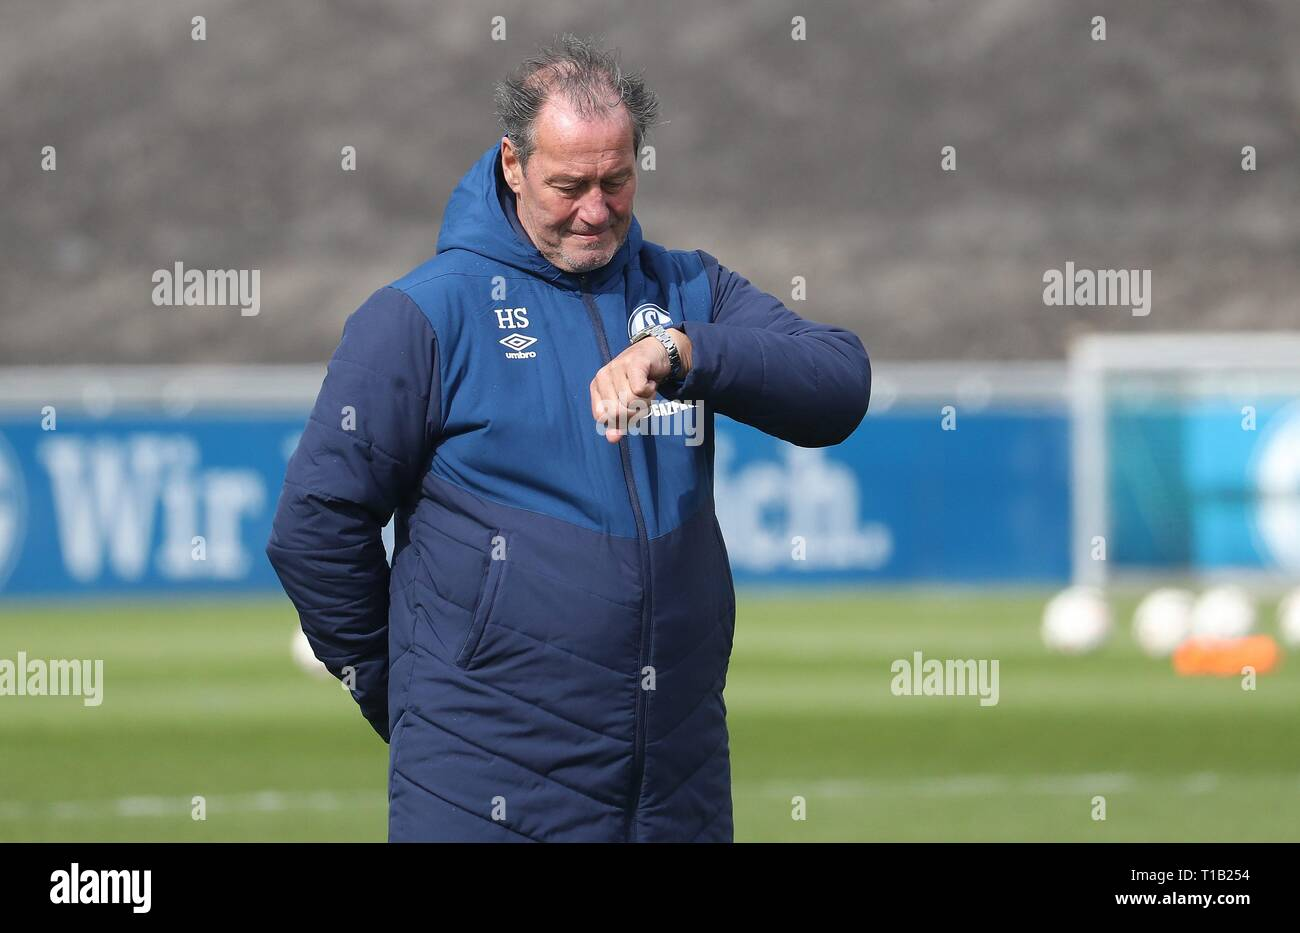 firo: 25.03.2019, Football, 2018/2019, 1.Bundesliga: FC Schalke 04 - Training Huub Stevens, gesture, looks at the clock   usage worldwide - Stock Image